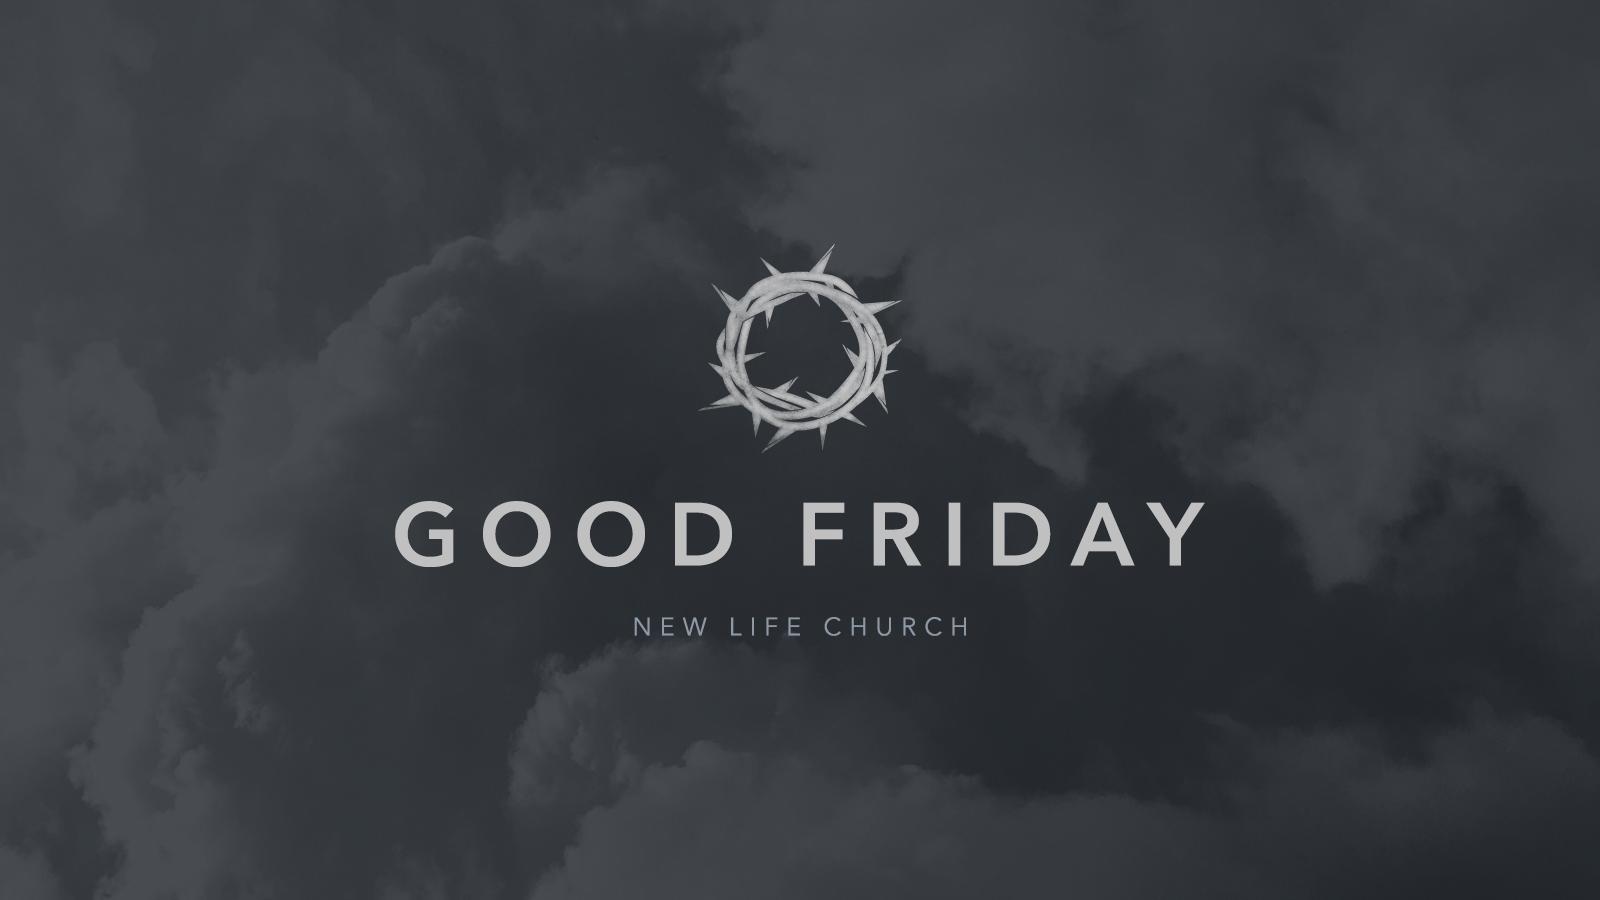 Good Friday 19.jpg